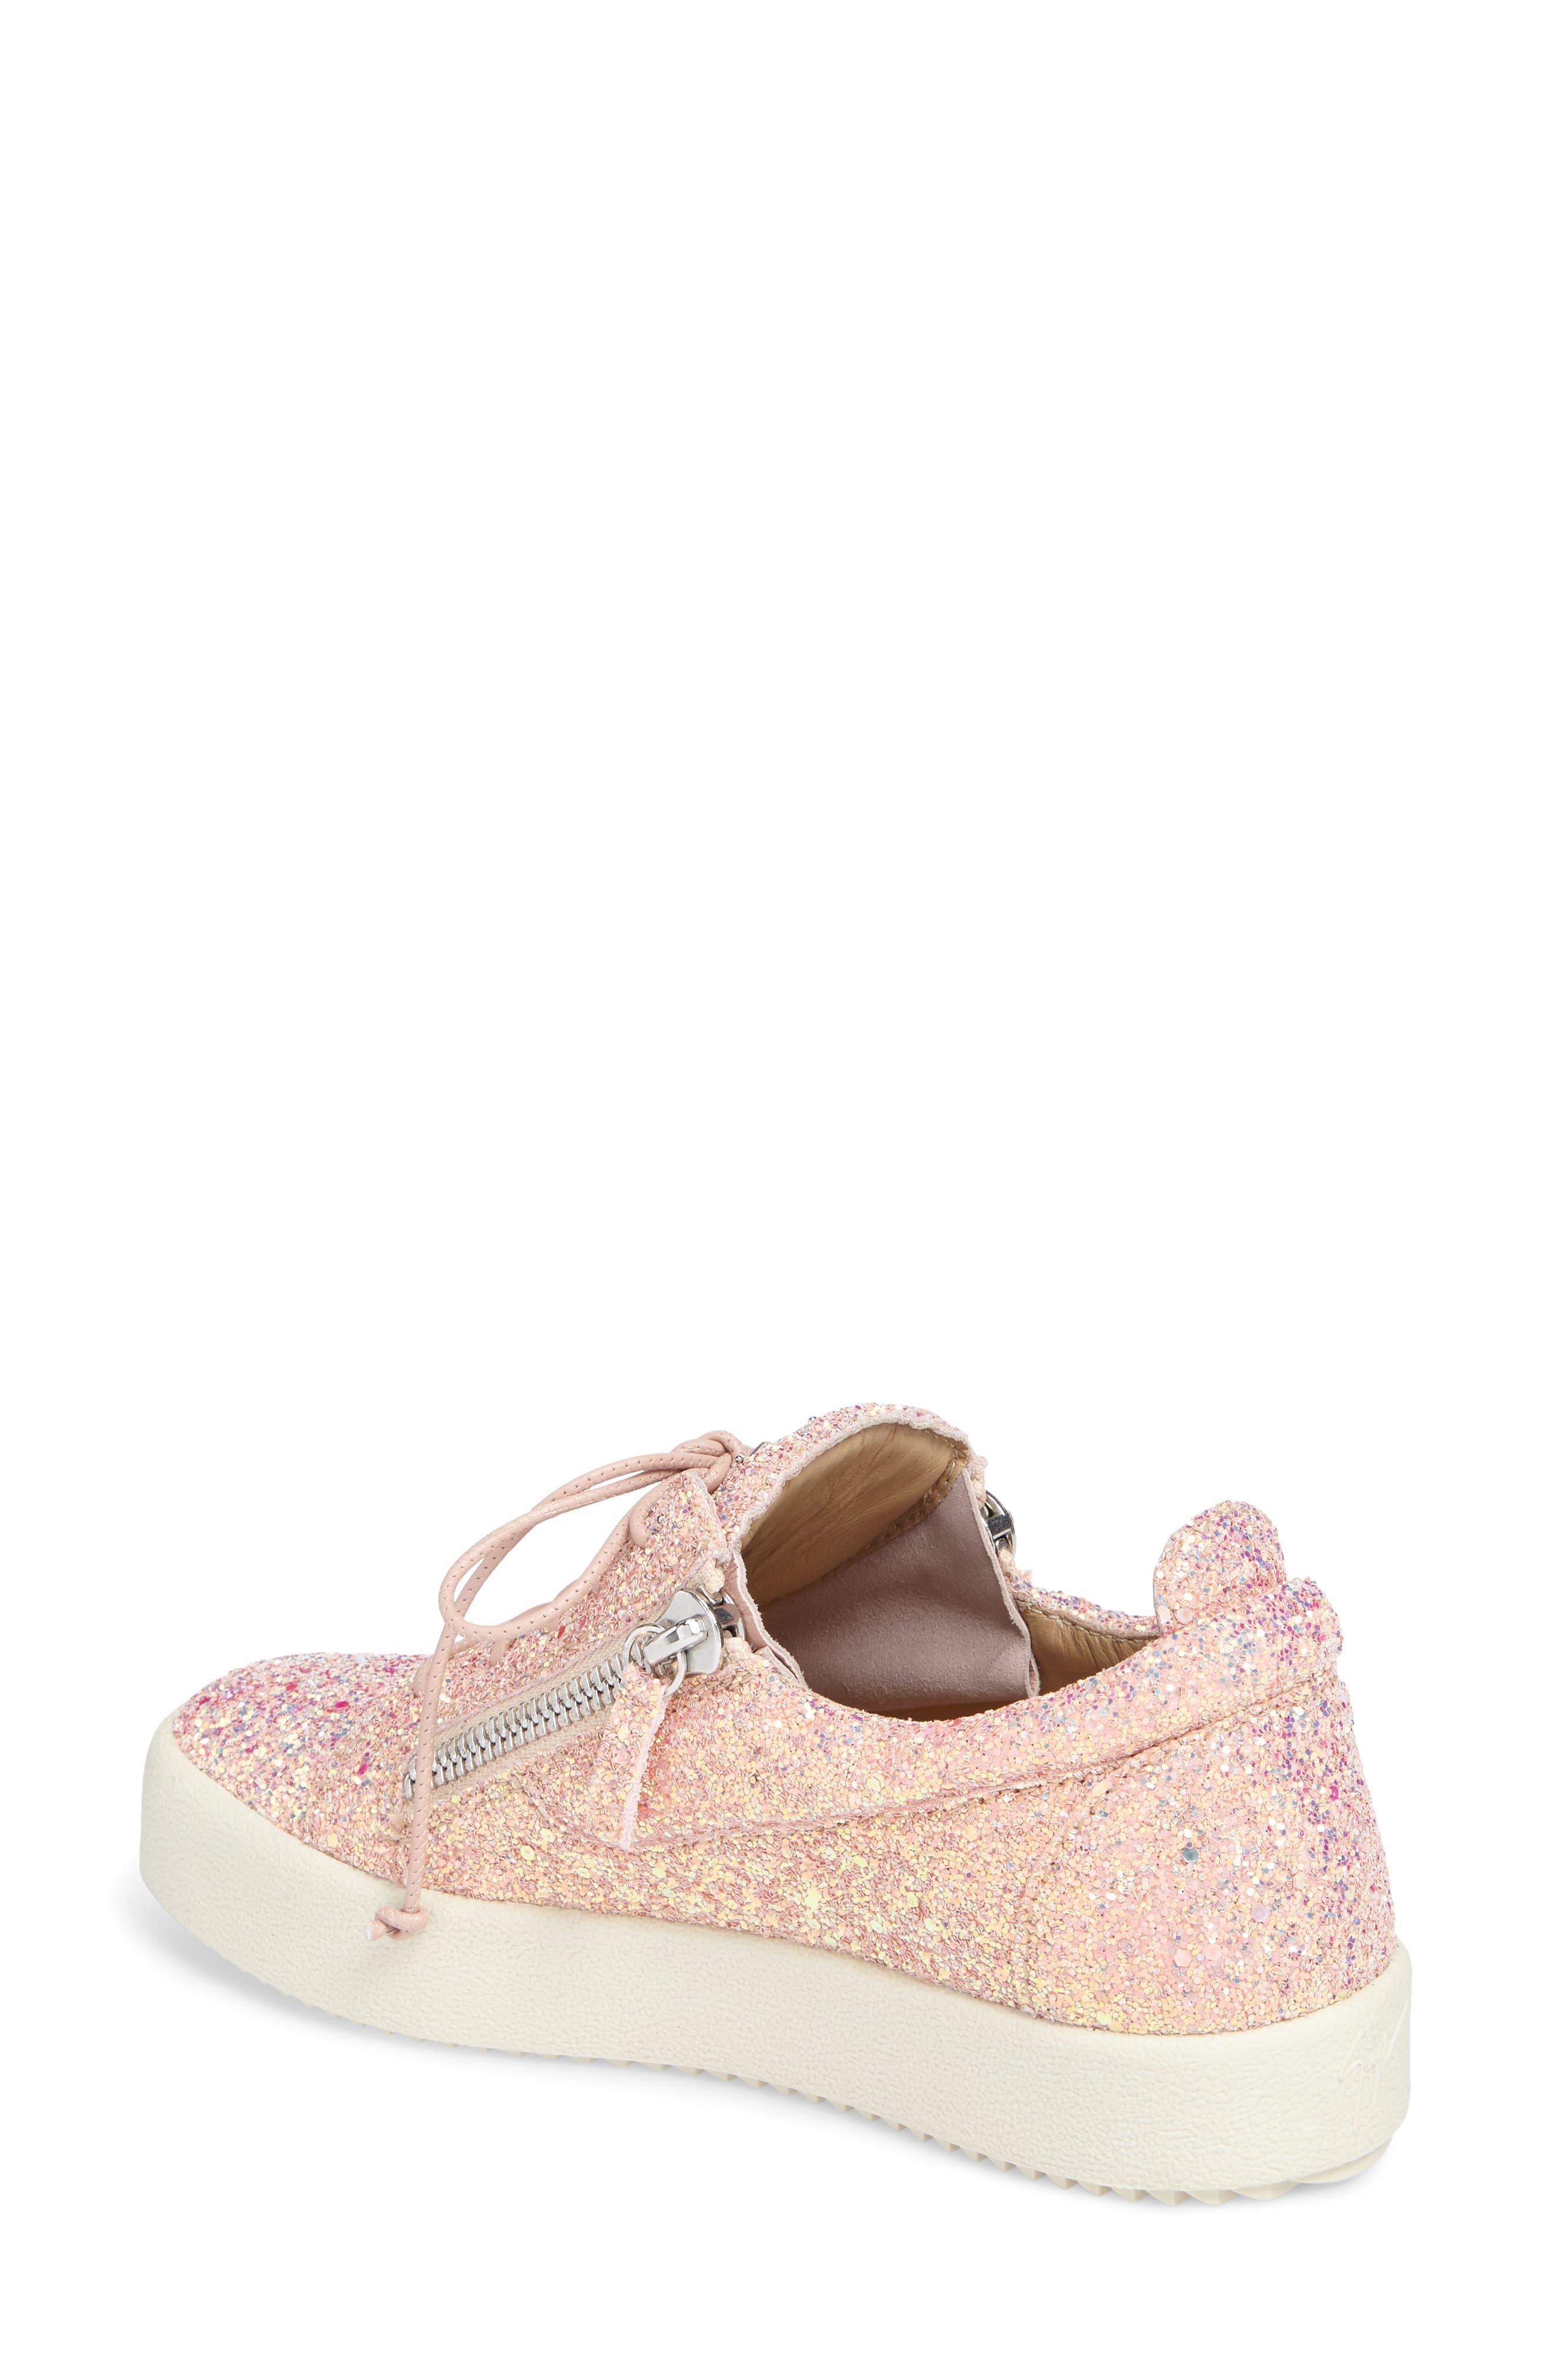 Alternate Image 2  - Giuseppe Zanotti May London Low Top Sneaker (Women)